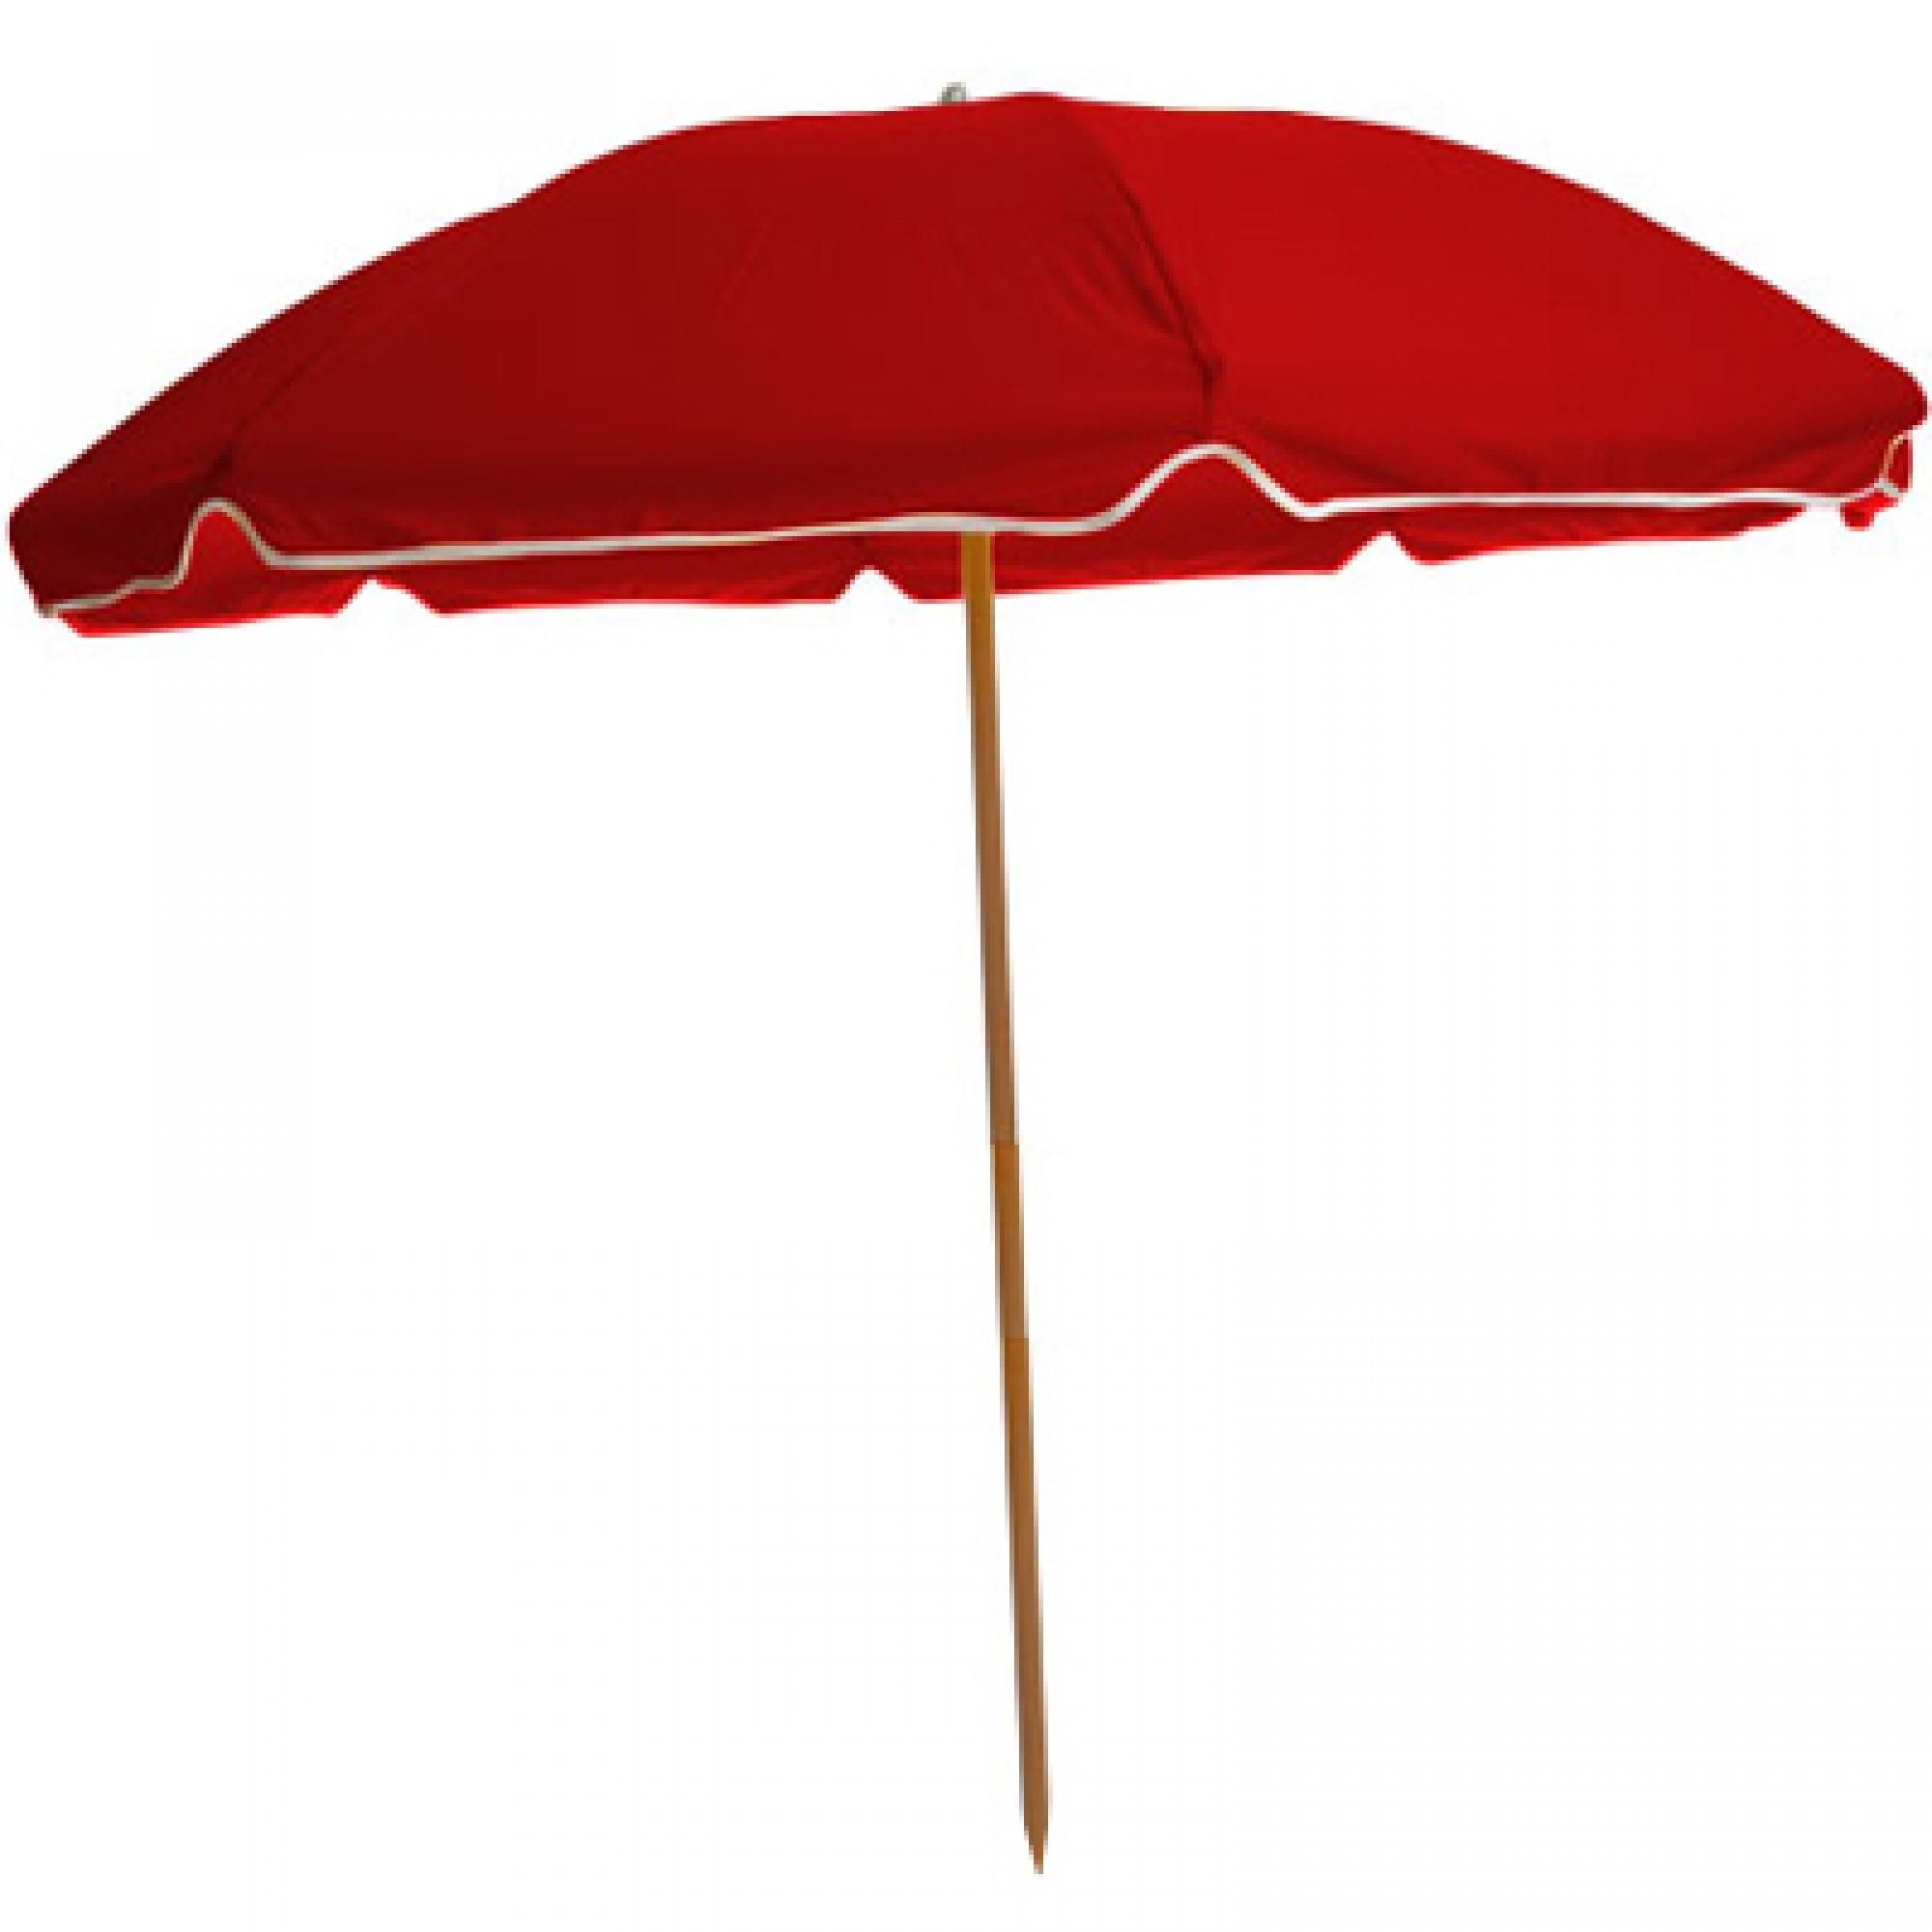 Shop Sunbrella Beach Umbrella With Wood Pole Red